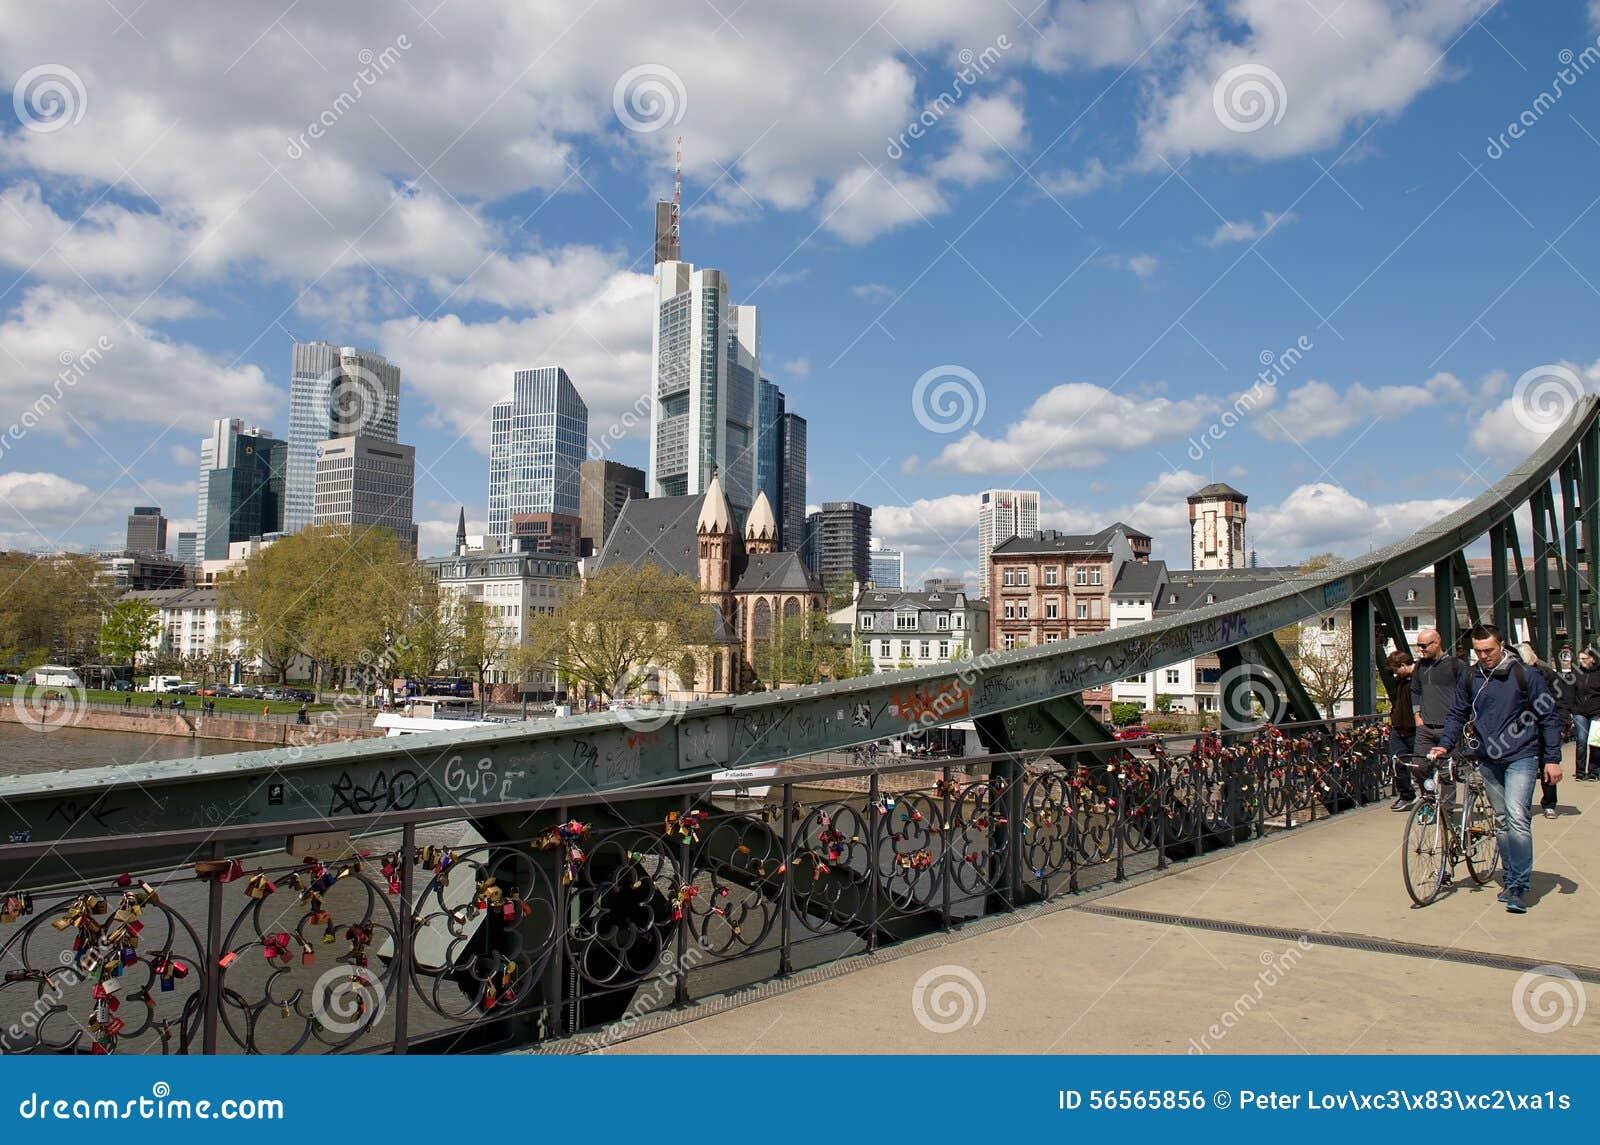 Download Πανόραμα της Φρανκφούρτης - γέφυρα για πεζούς Εκδοτική Εικόνες - εικόνα από ευρώπη, σύννεφα: 56565856